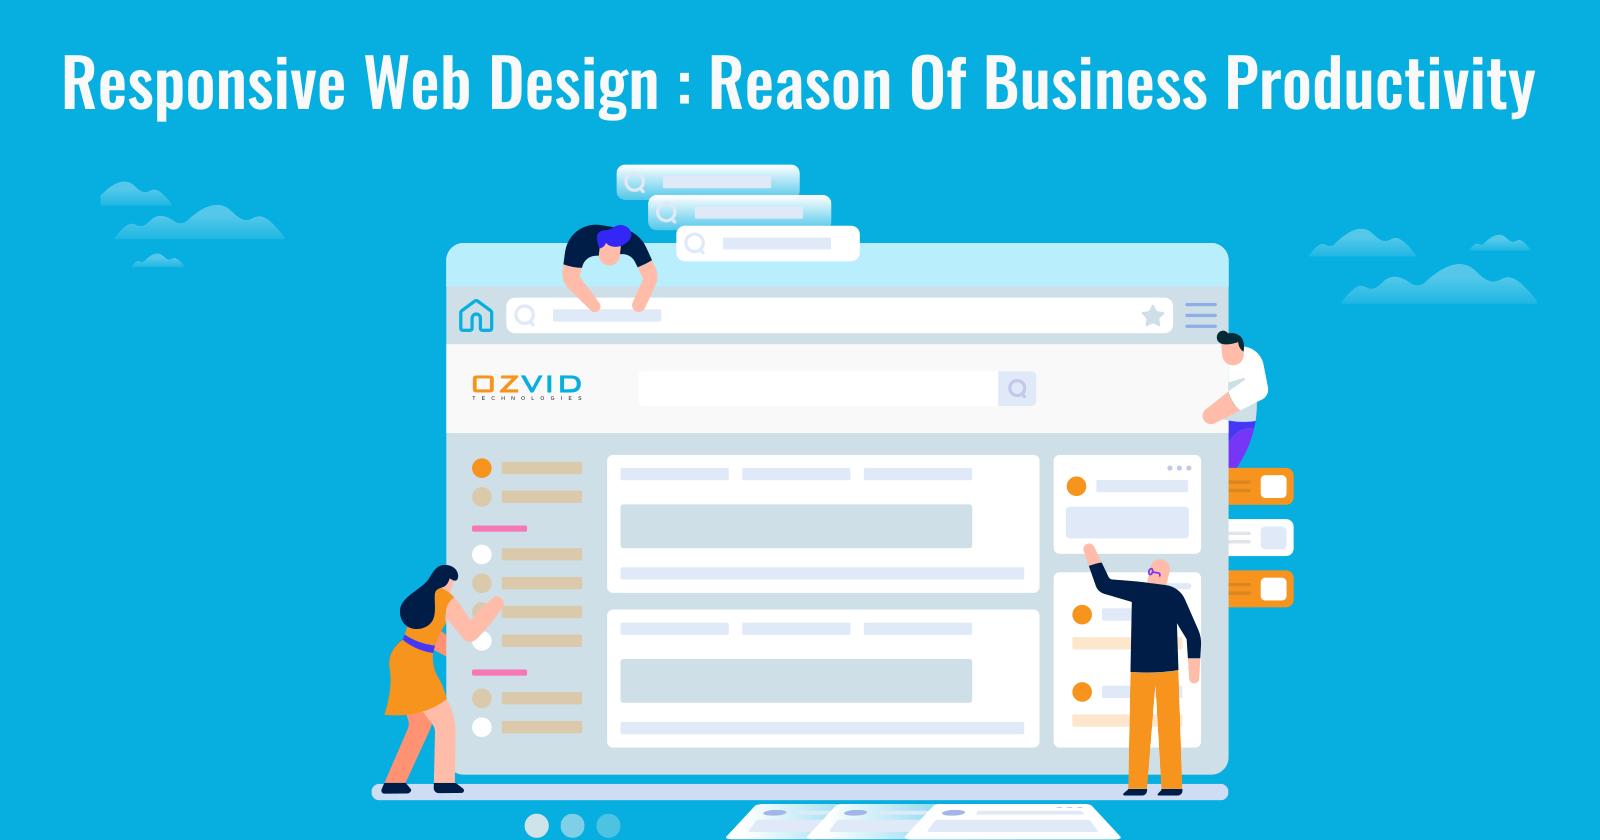 Responsive Web Design; Reason Of Business Productivity